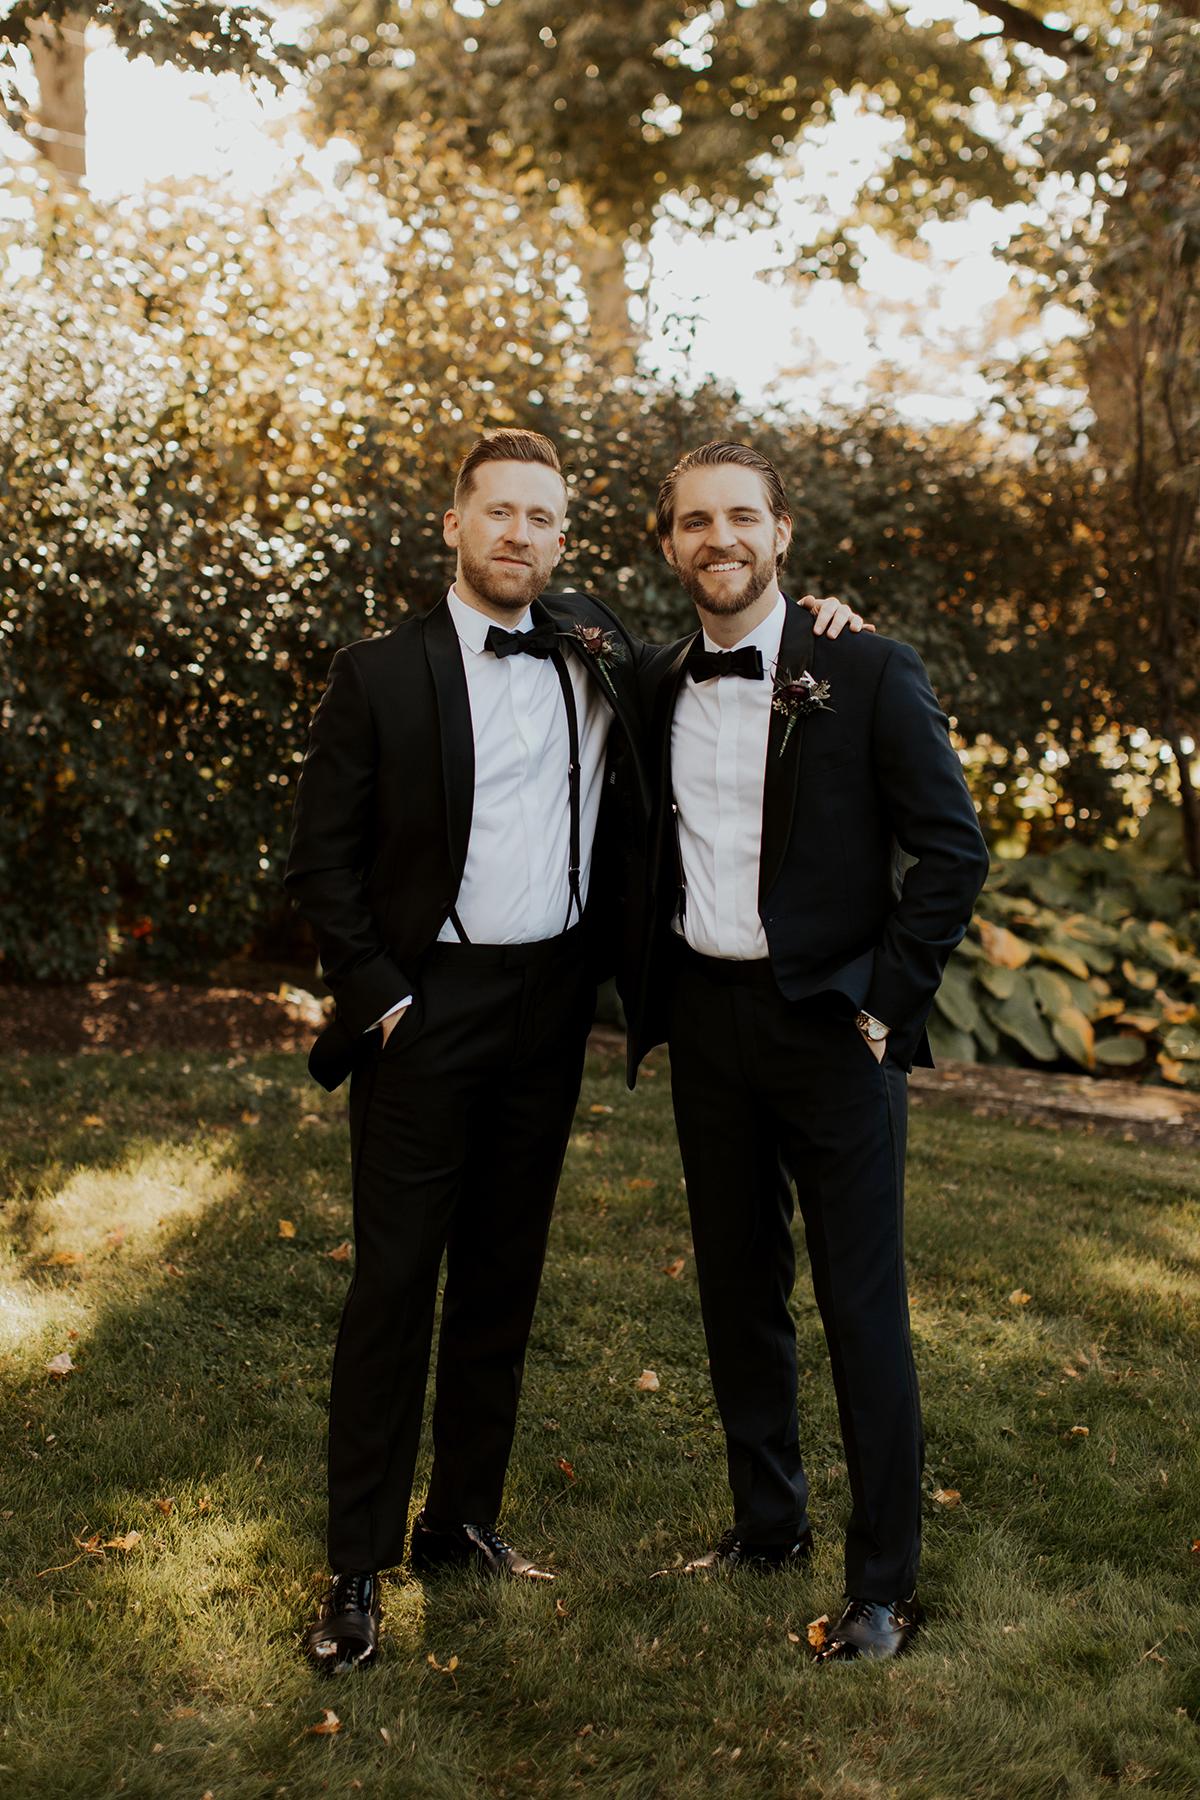 Katies Bliss Wedding Groomsmen